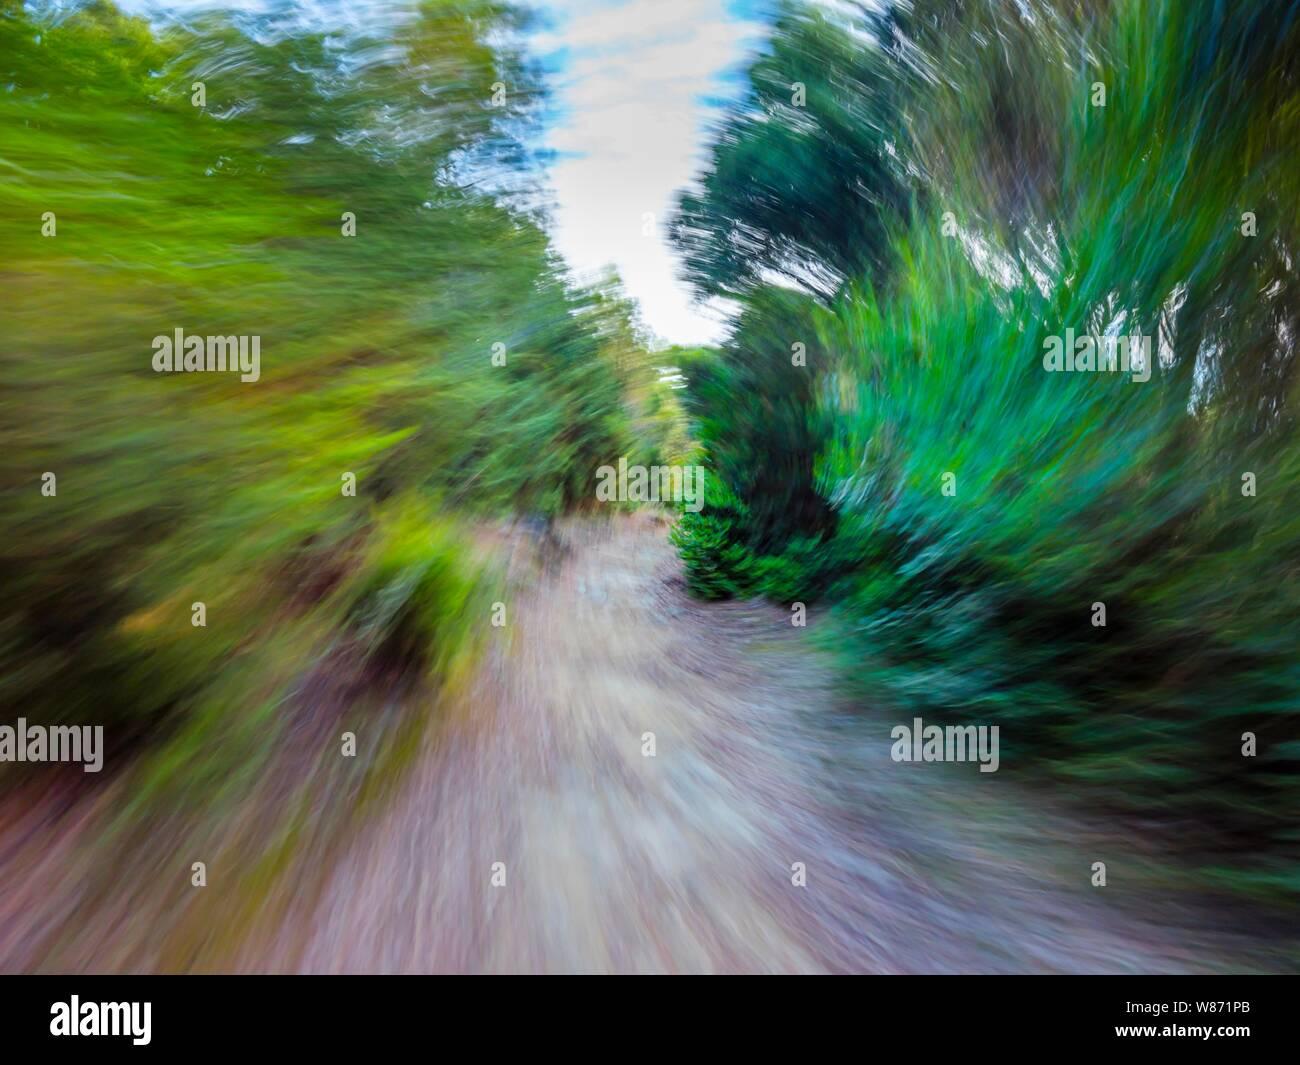 Green forest countryside path pathway speeding through dense trees circular twirl motion Stock Photo